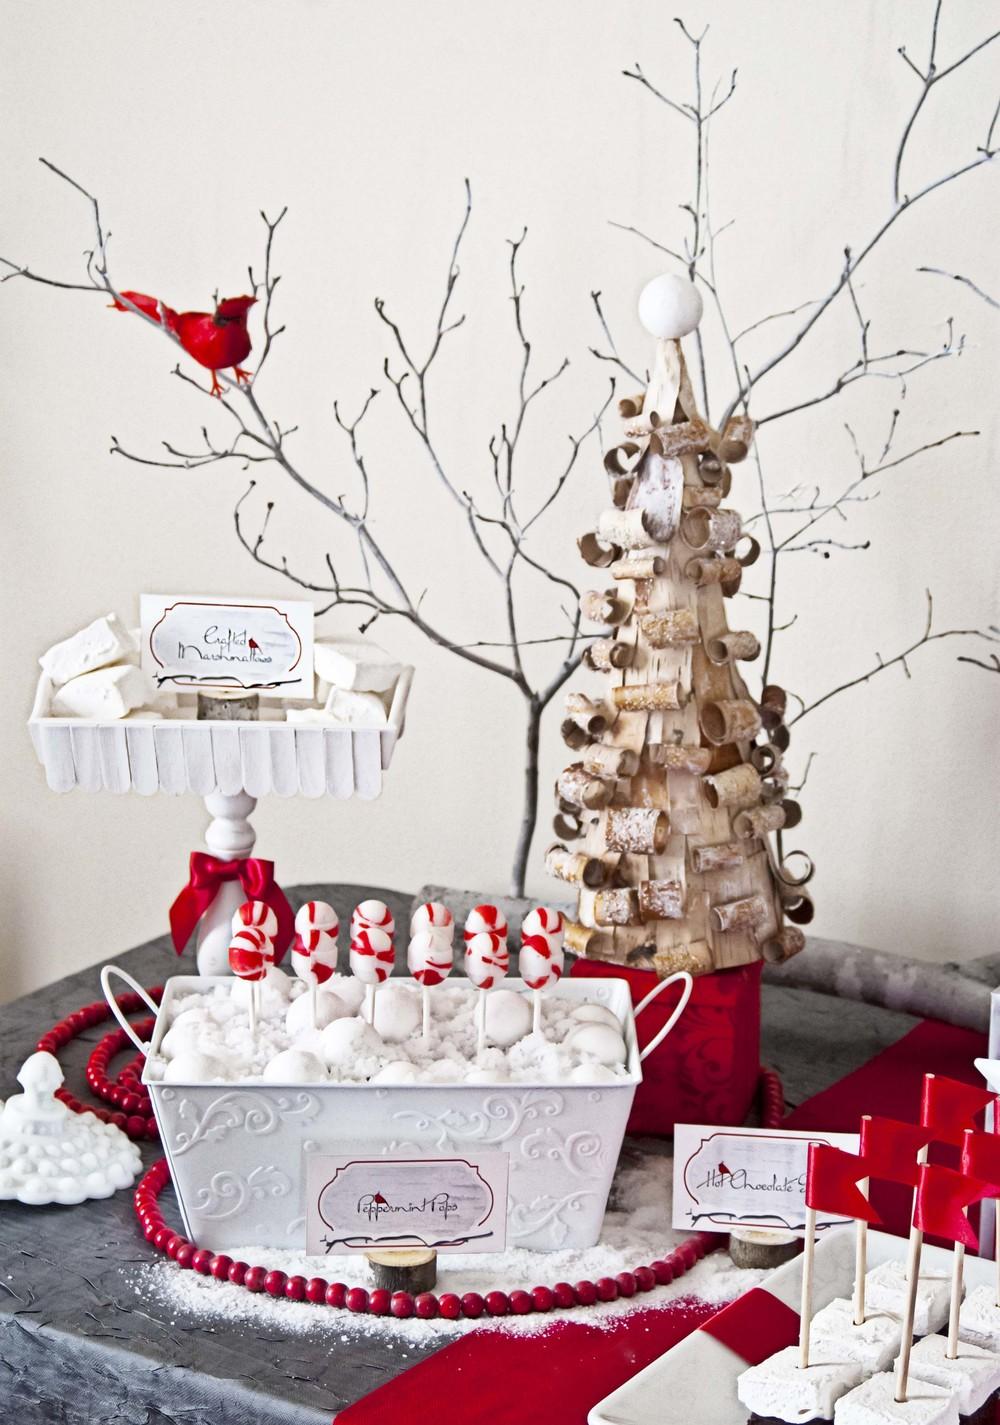 Cardinal_Christmas_Table1.jpg